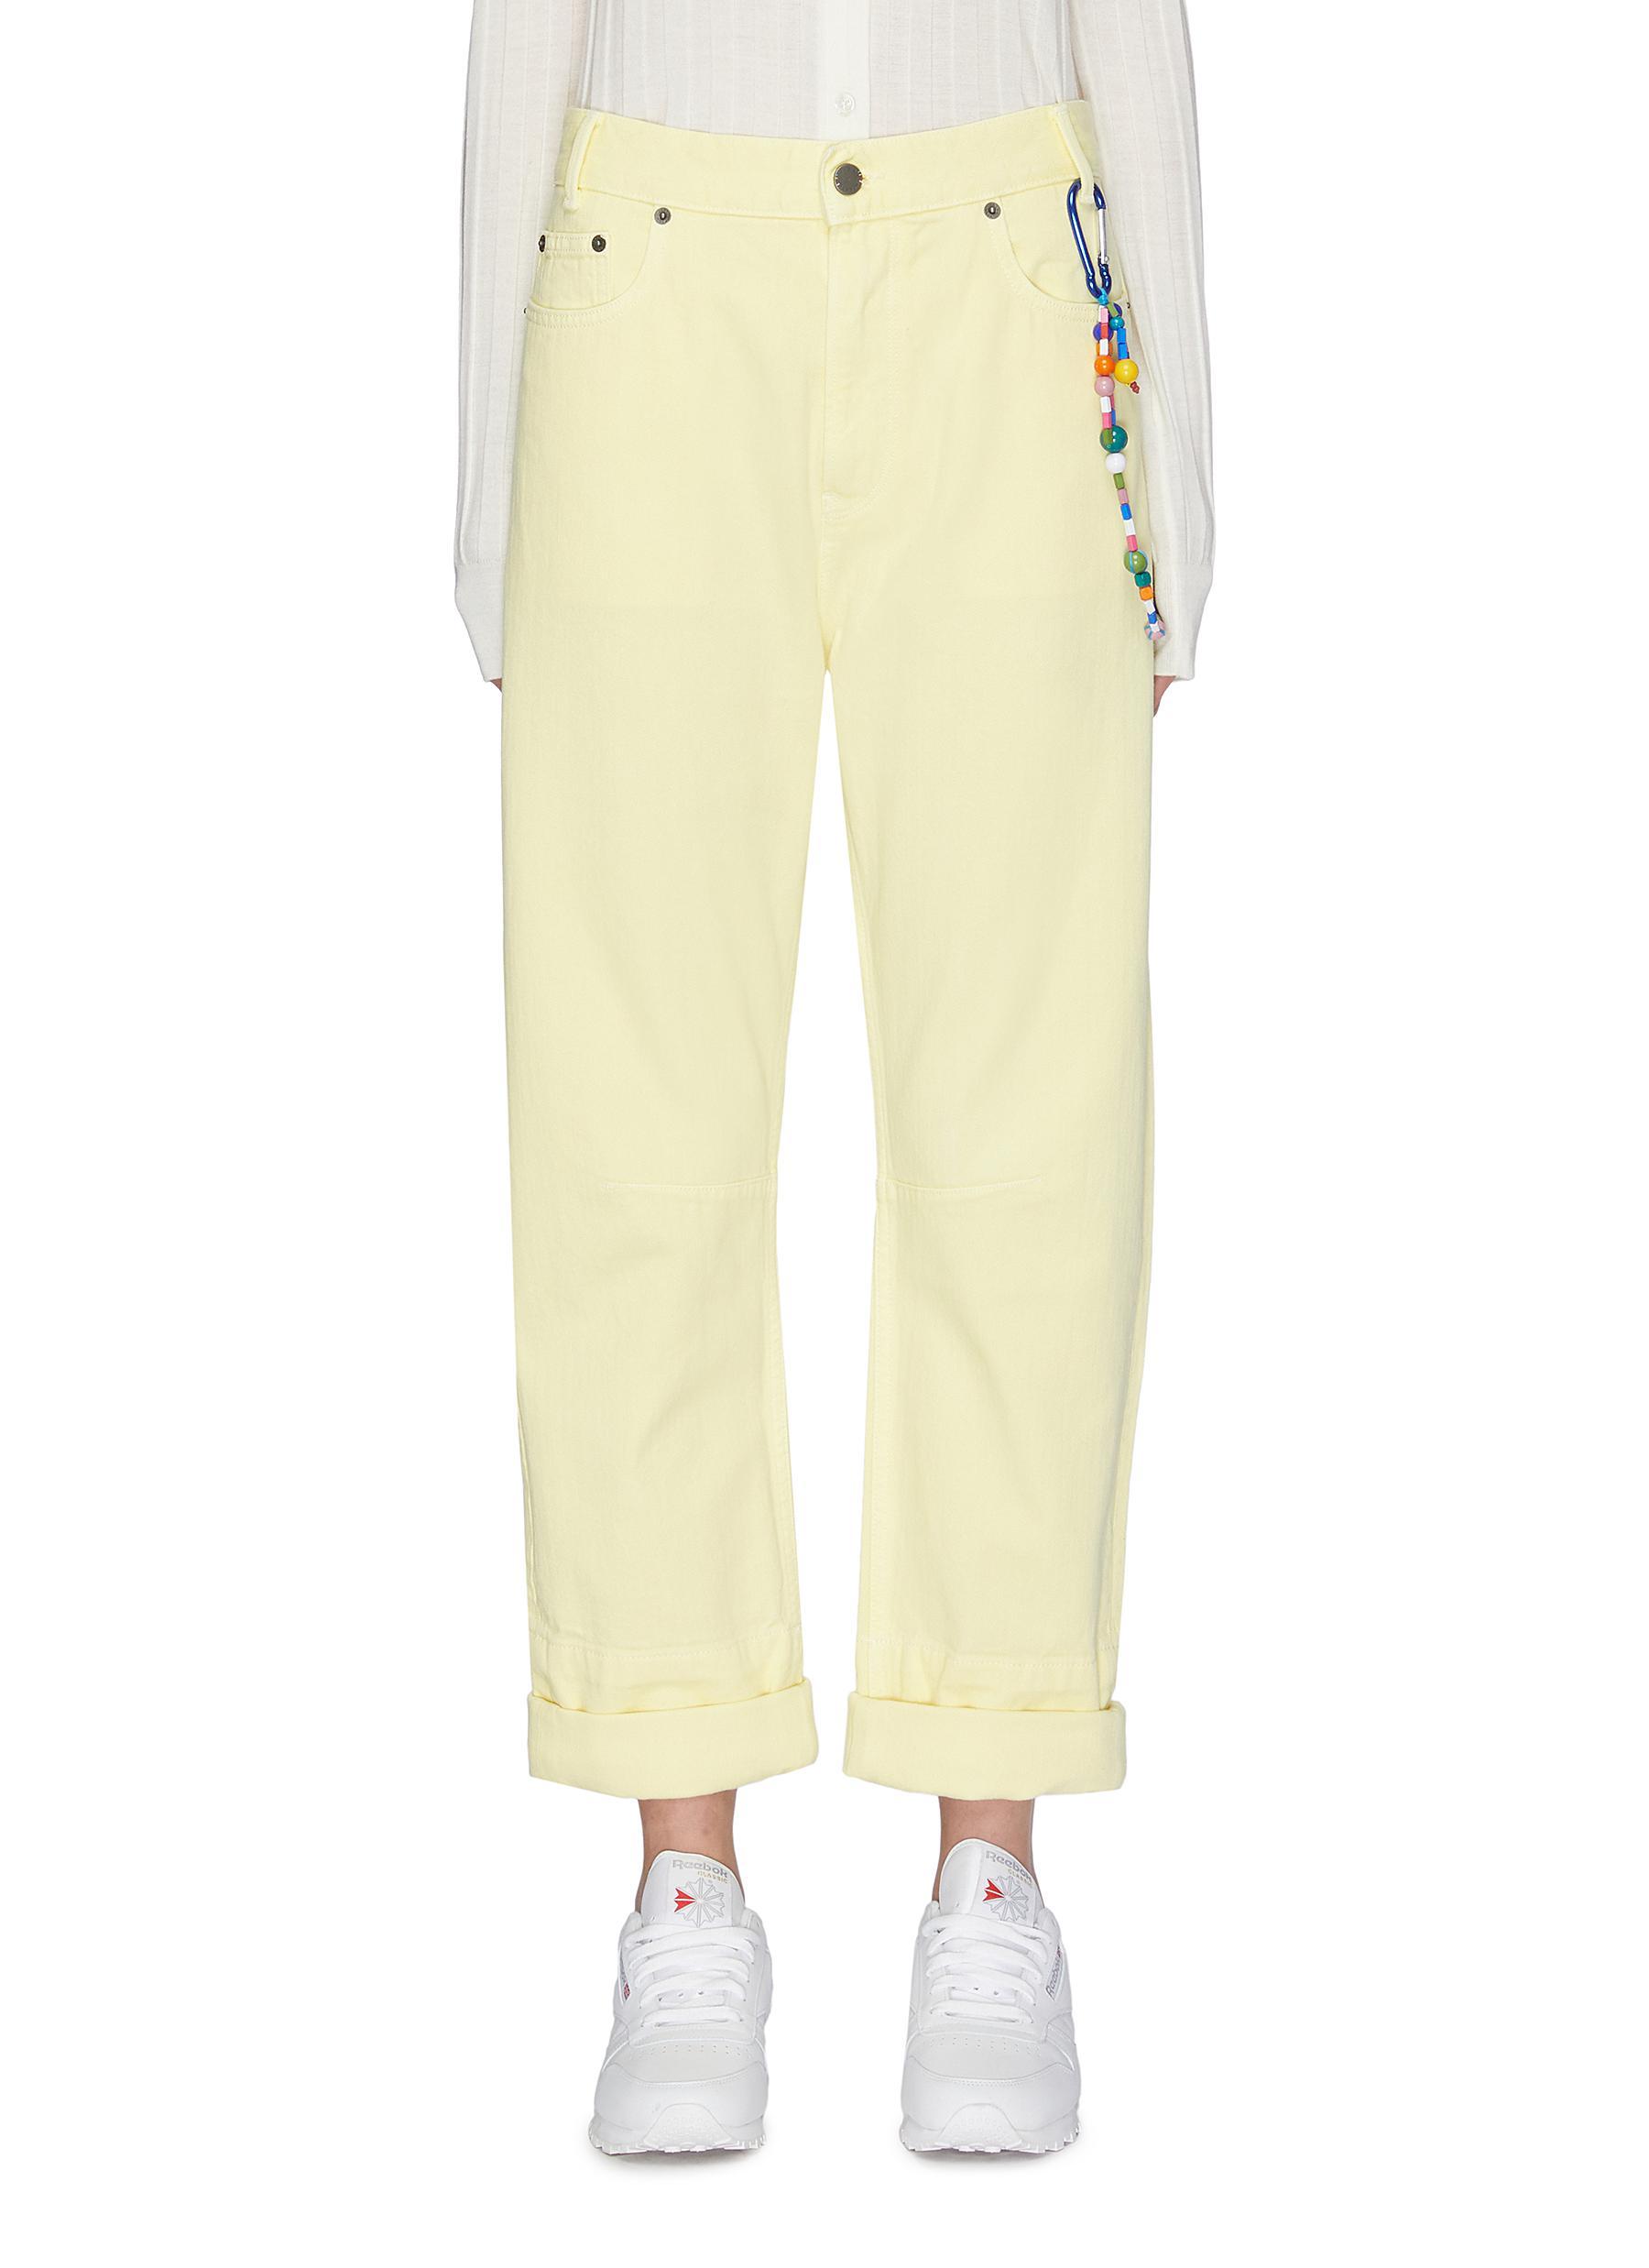 shop Mira Mikati Keyring Spray Paint Jeans online